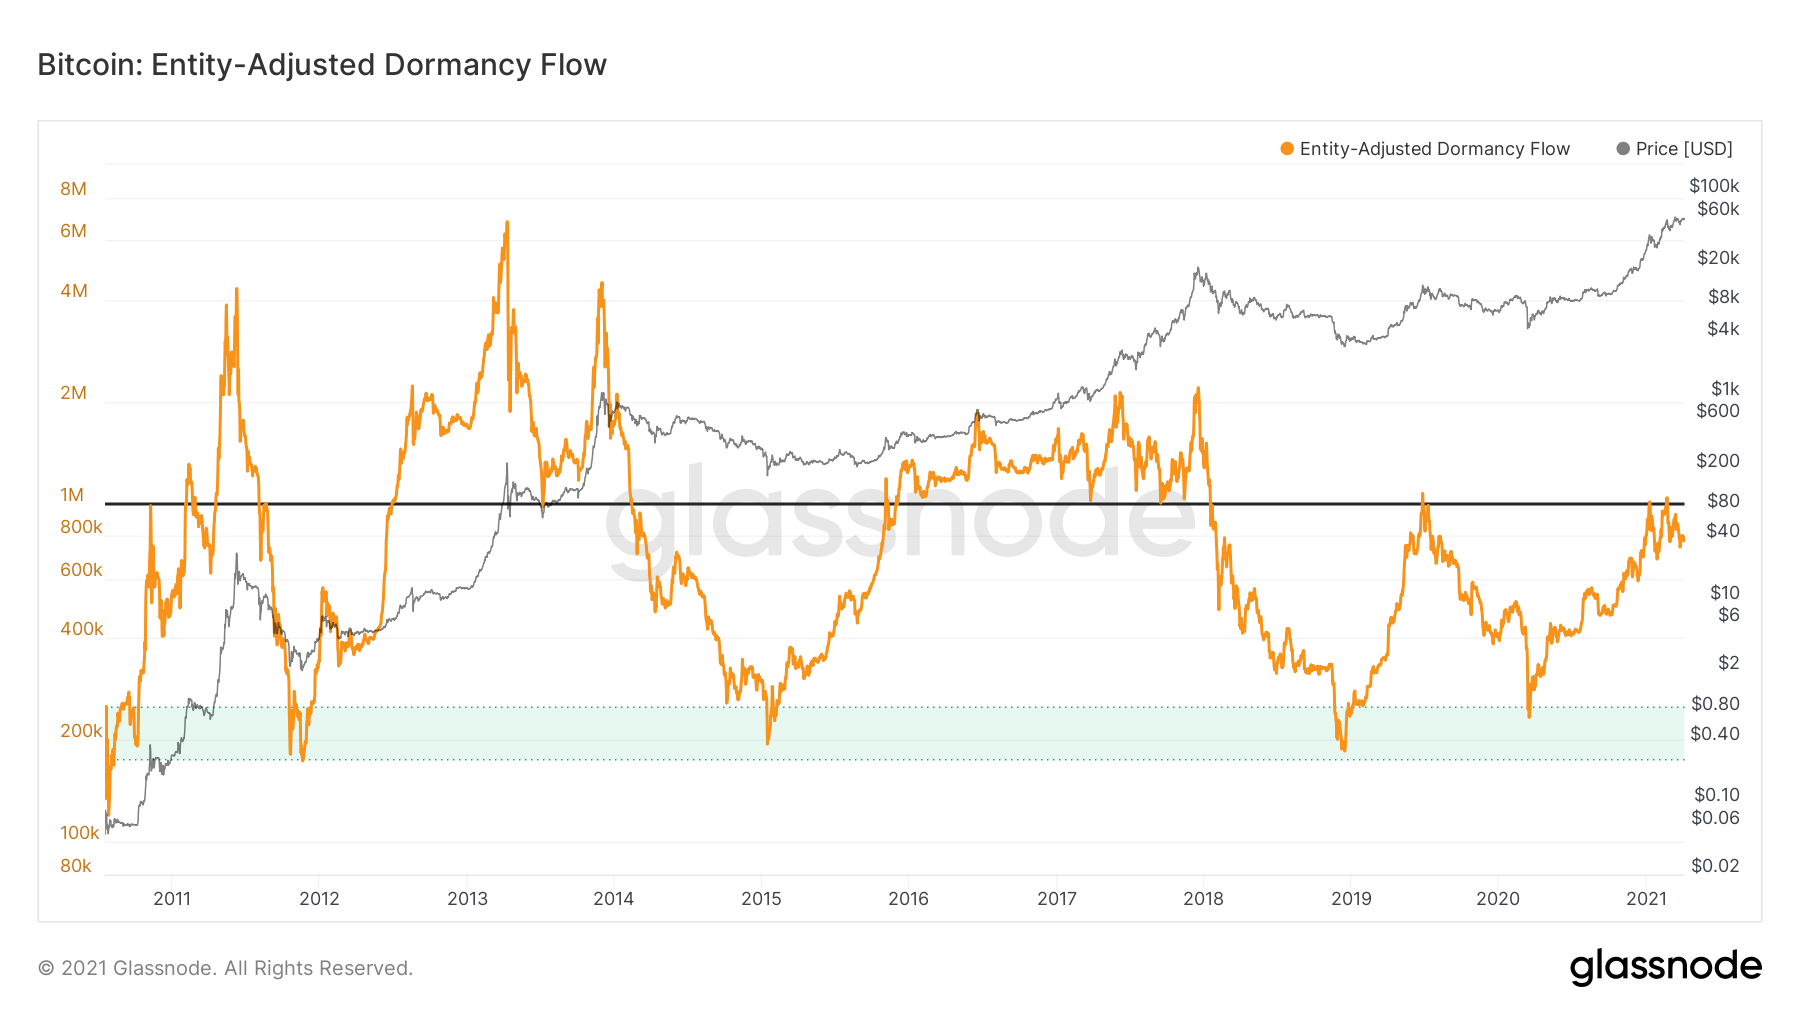 Bitcoin Entity-Adjusted Dormancy Flow by Glassnode